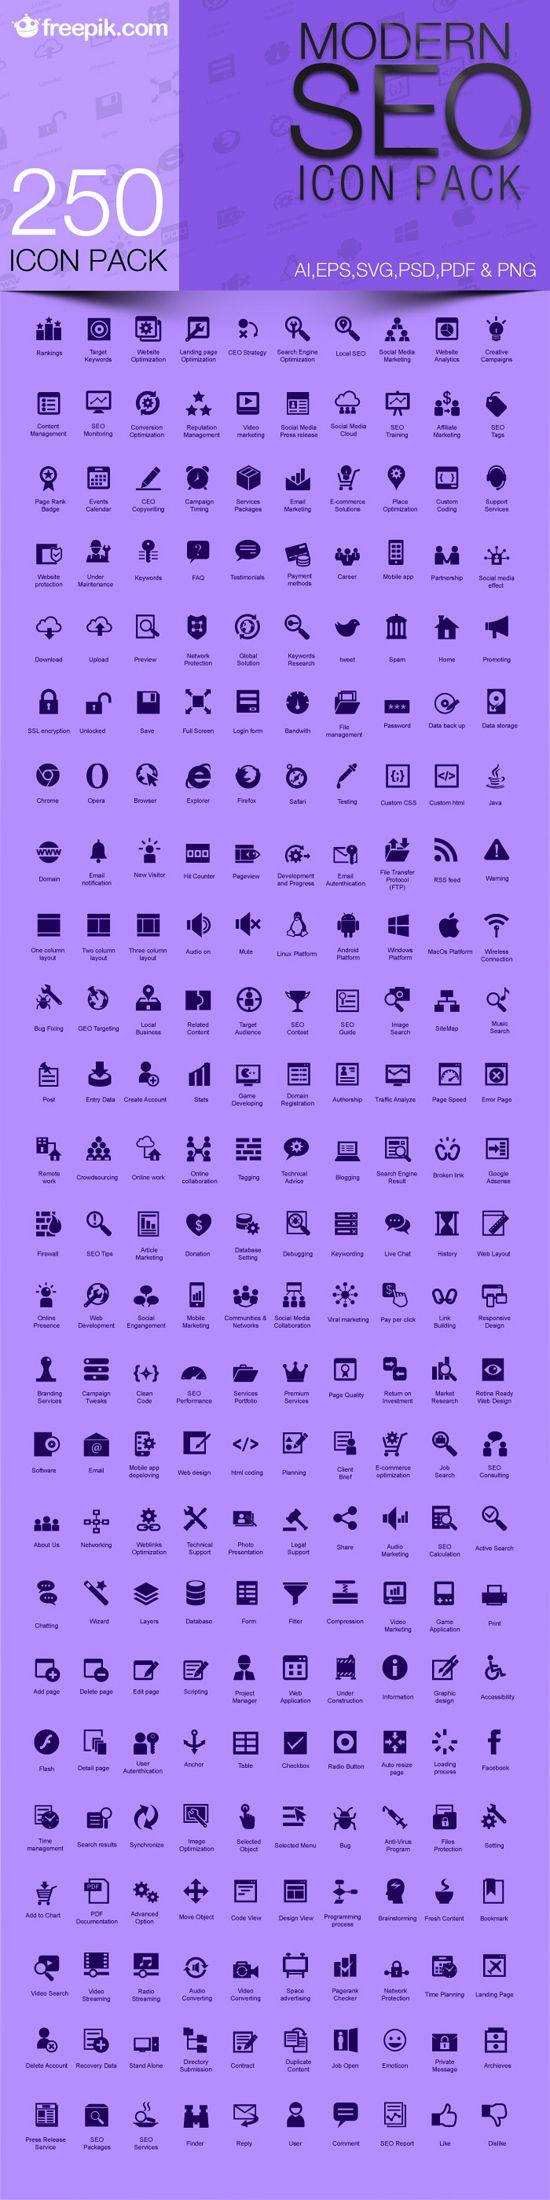 Free Download Modern Seo Icon Pack Web Design Freebies Design Freebie Web Design